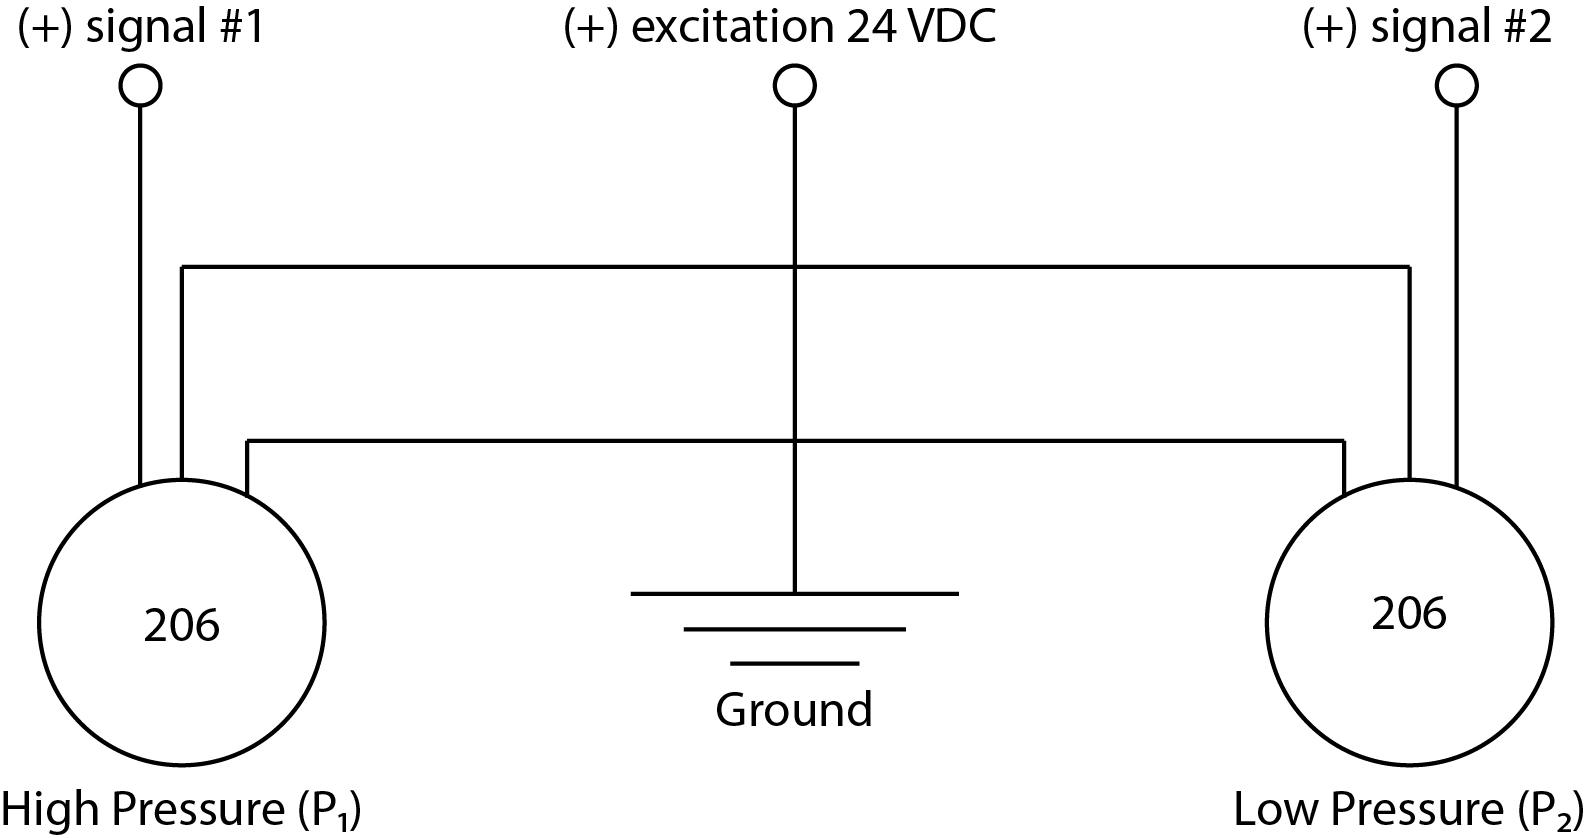 Option A signal image Model 206